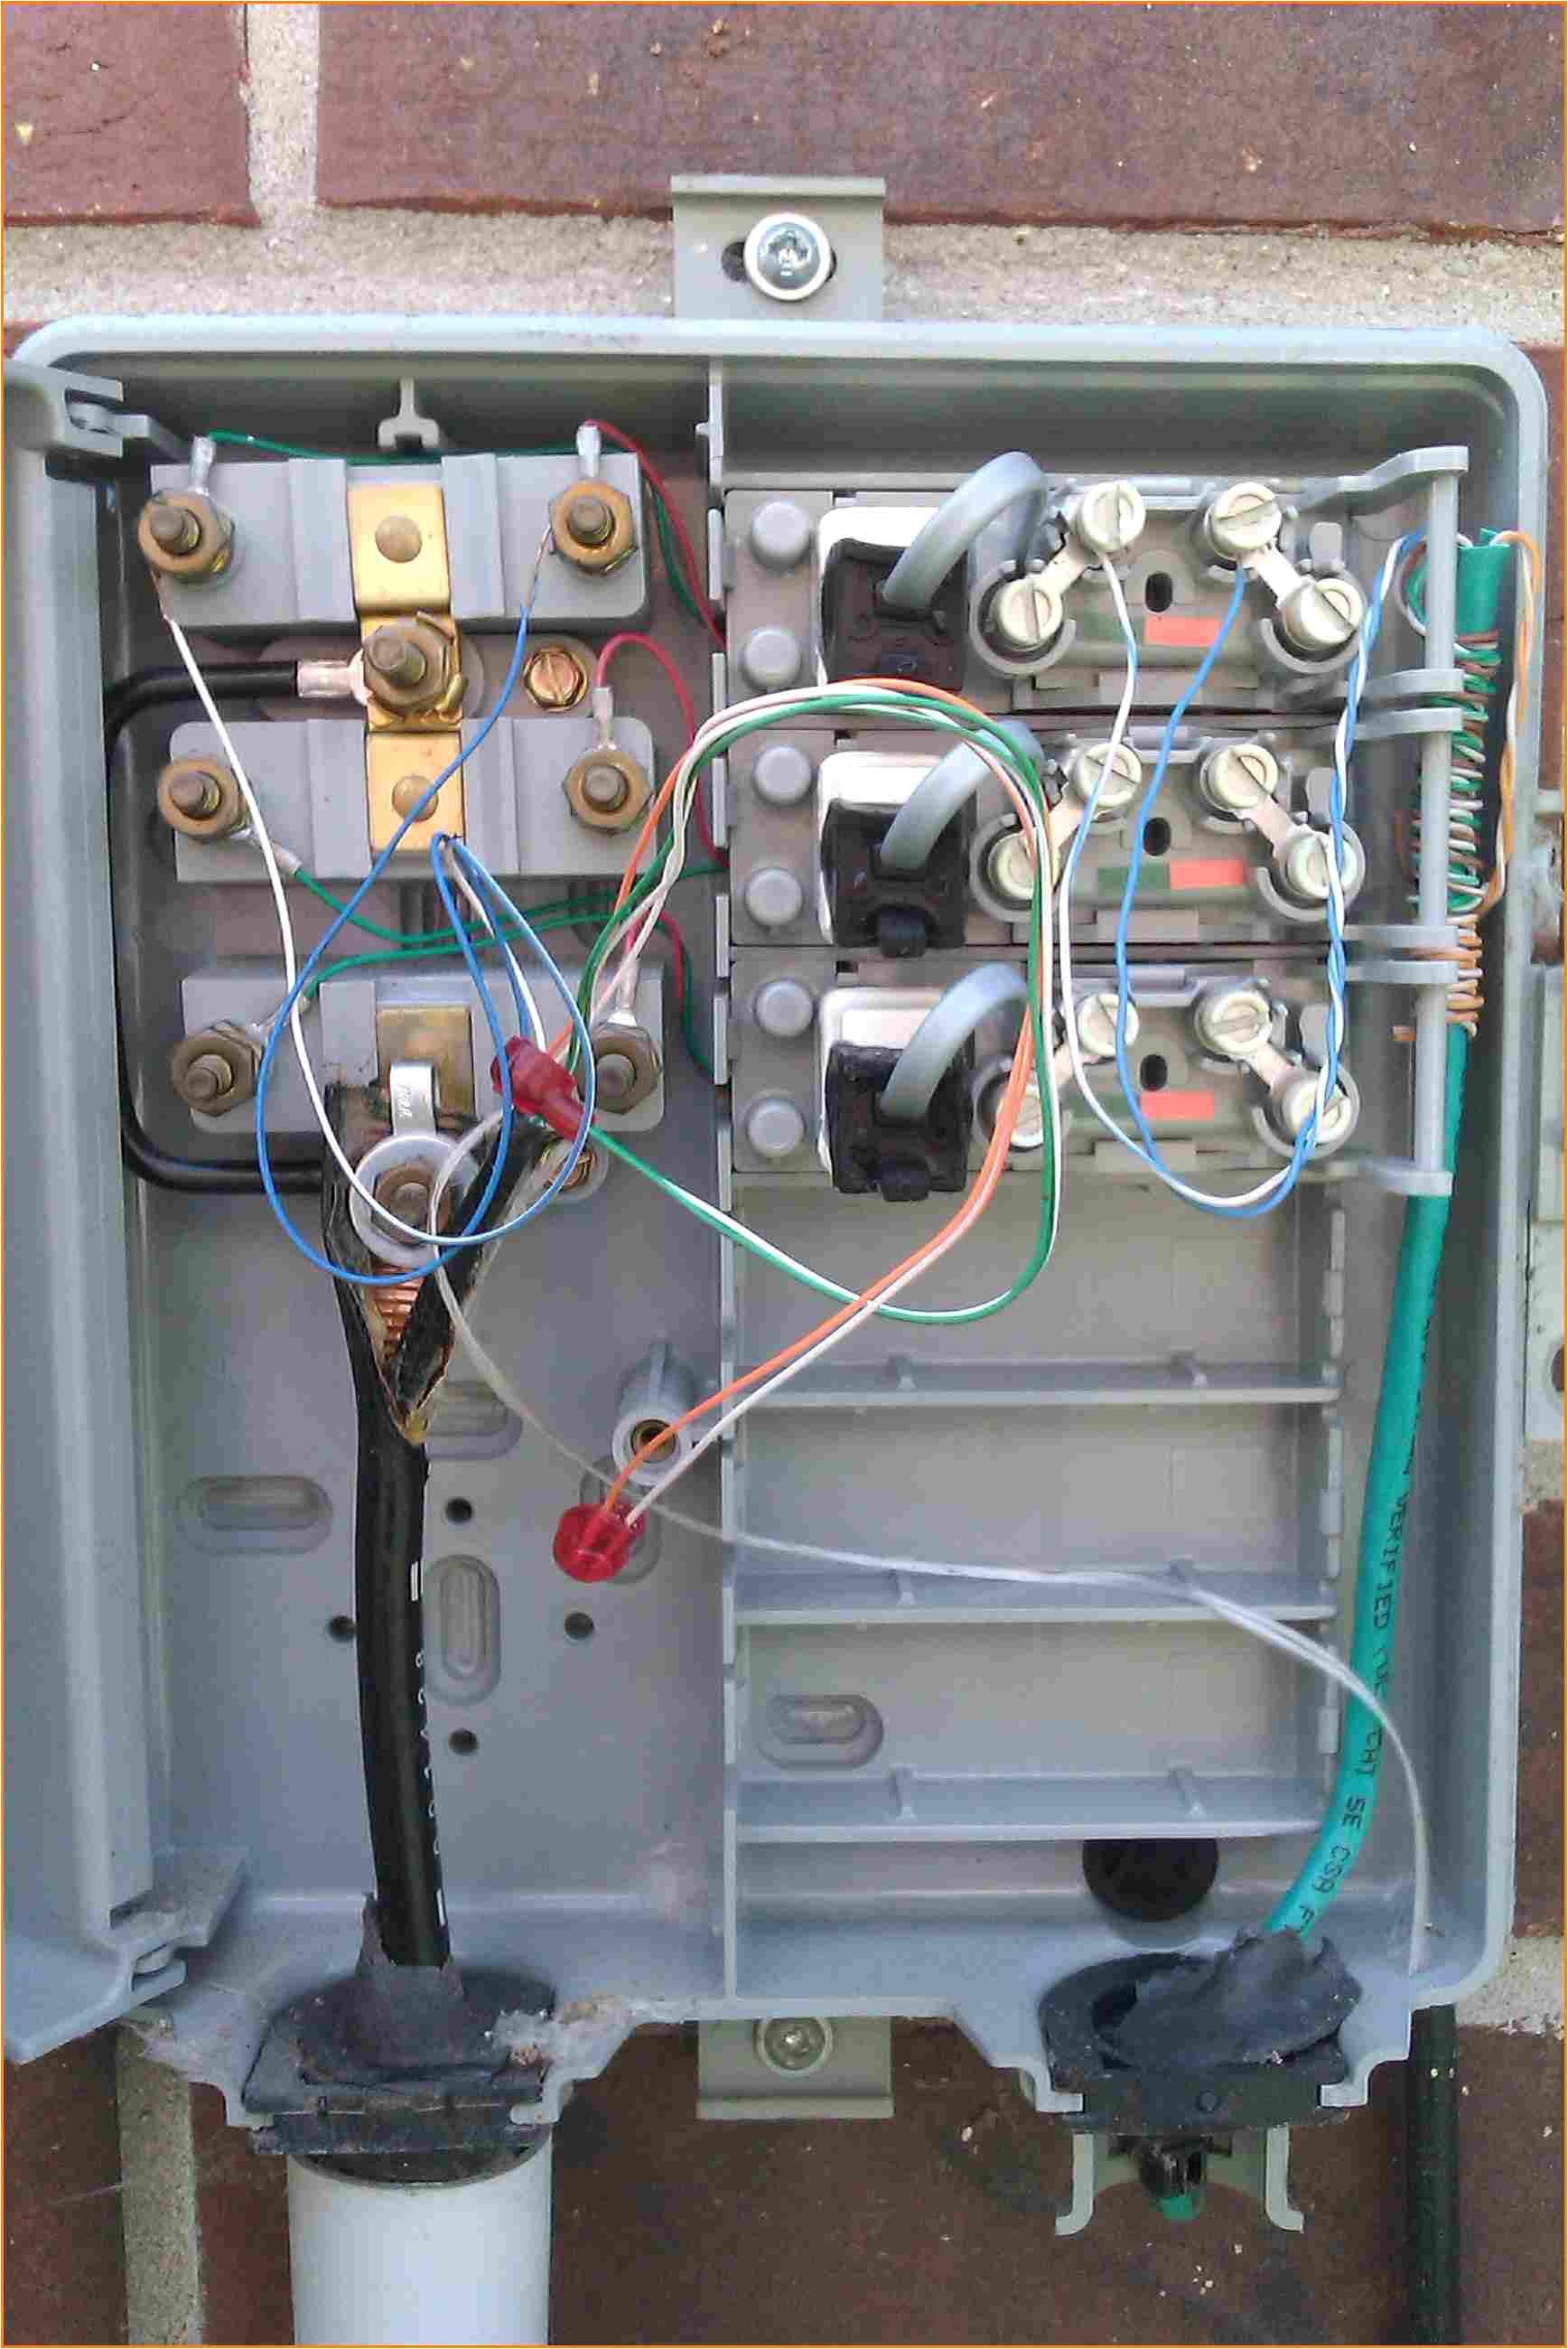 at amp t u verse nid wiring diagram premium wiring diagram blog at amp t u verse phone and internet wiring diagram